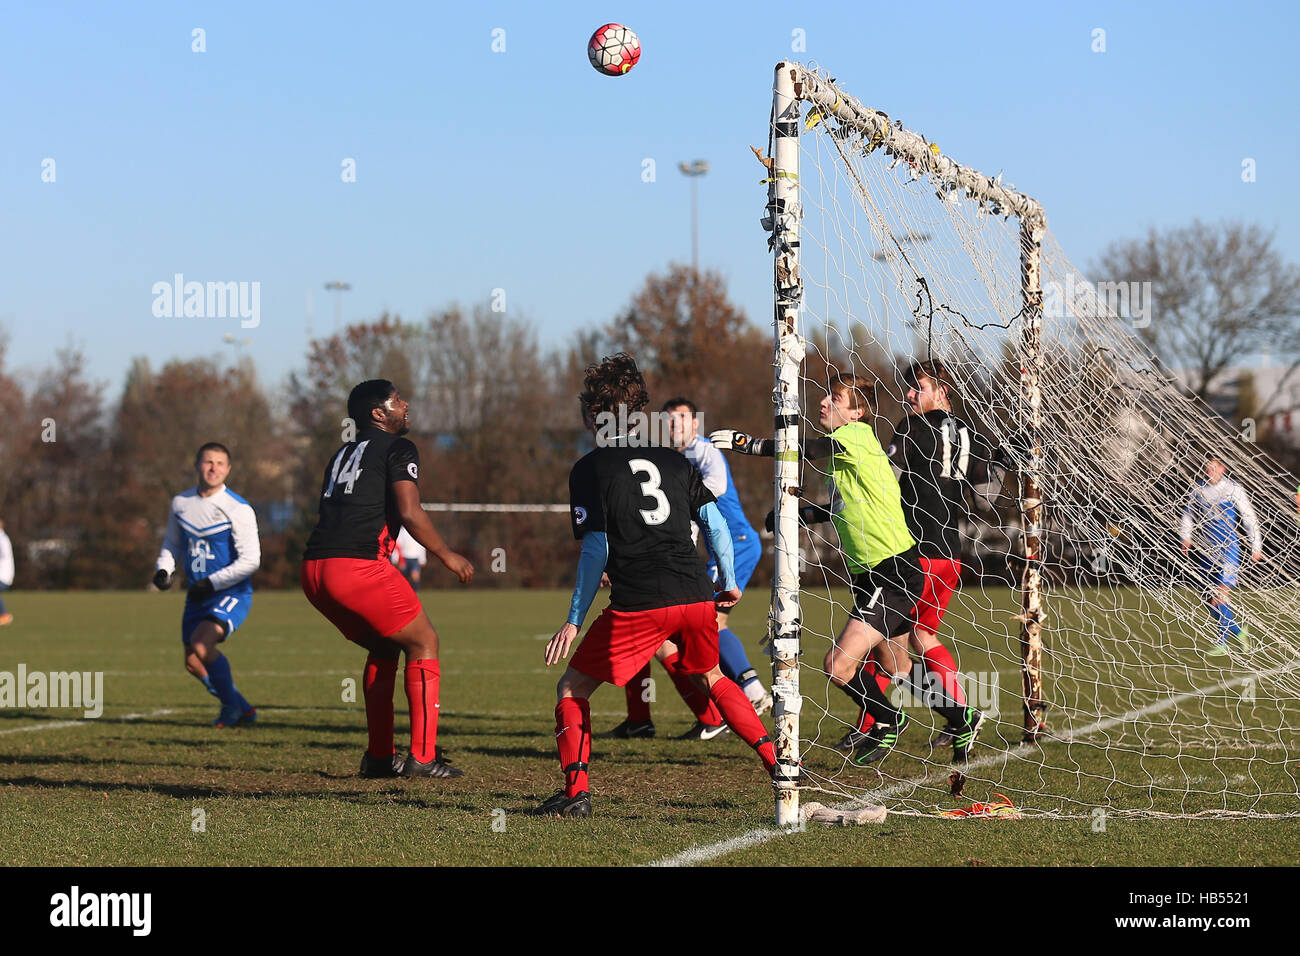 Krystal score their first goal during Mustard (red/black) vs FC Krystal, Hackney & Leyton Sunday League Football - Stock Image